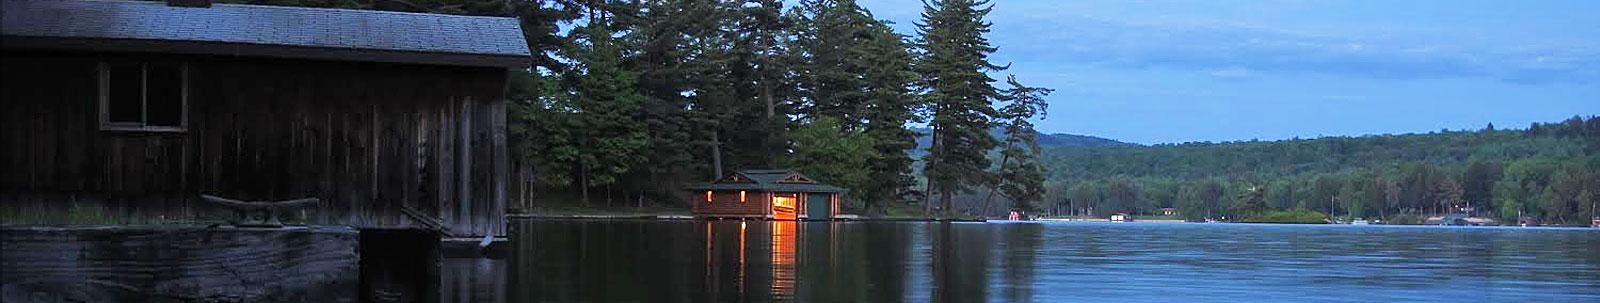 lake-dusk-int